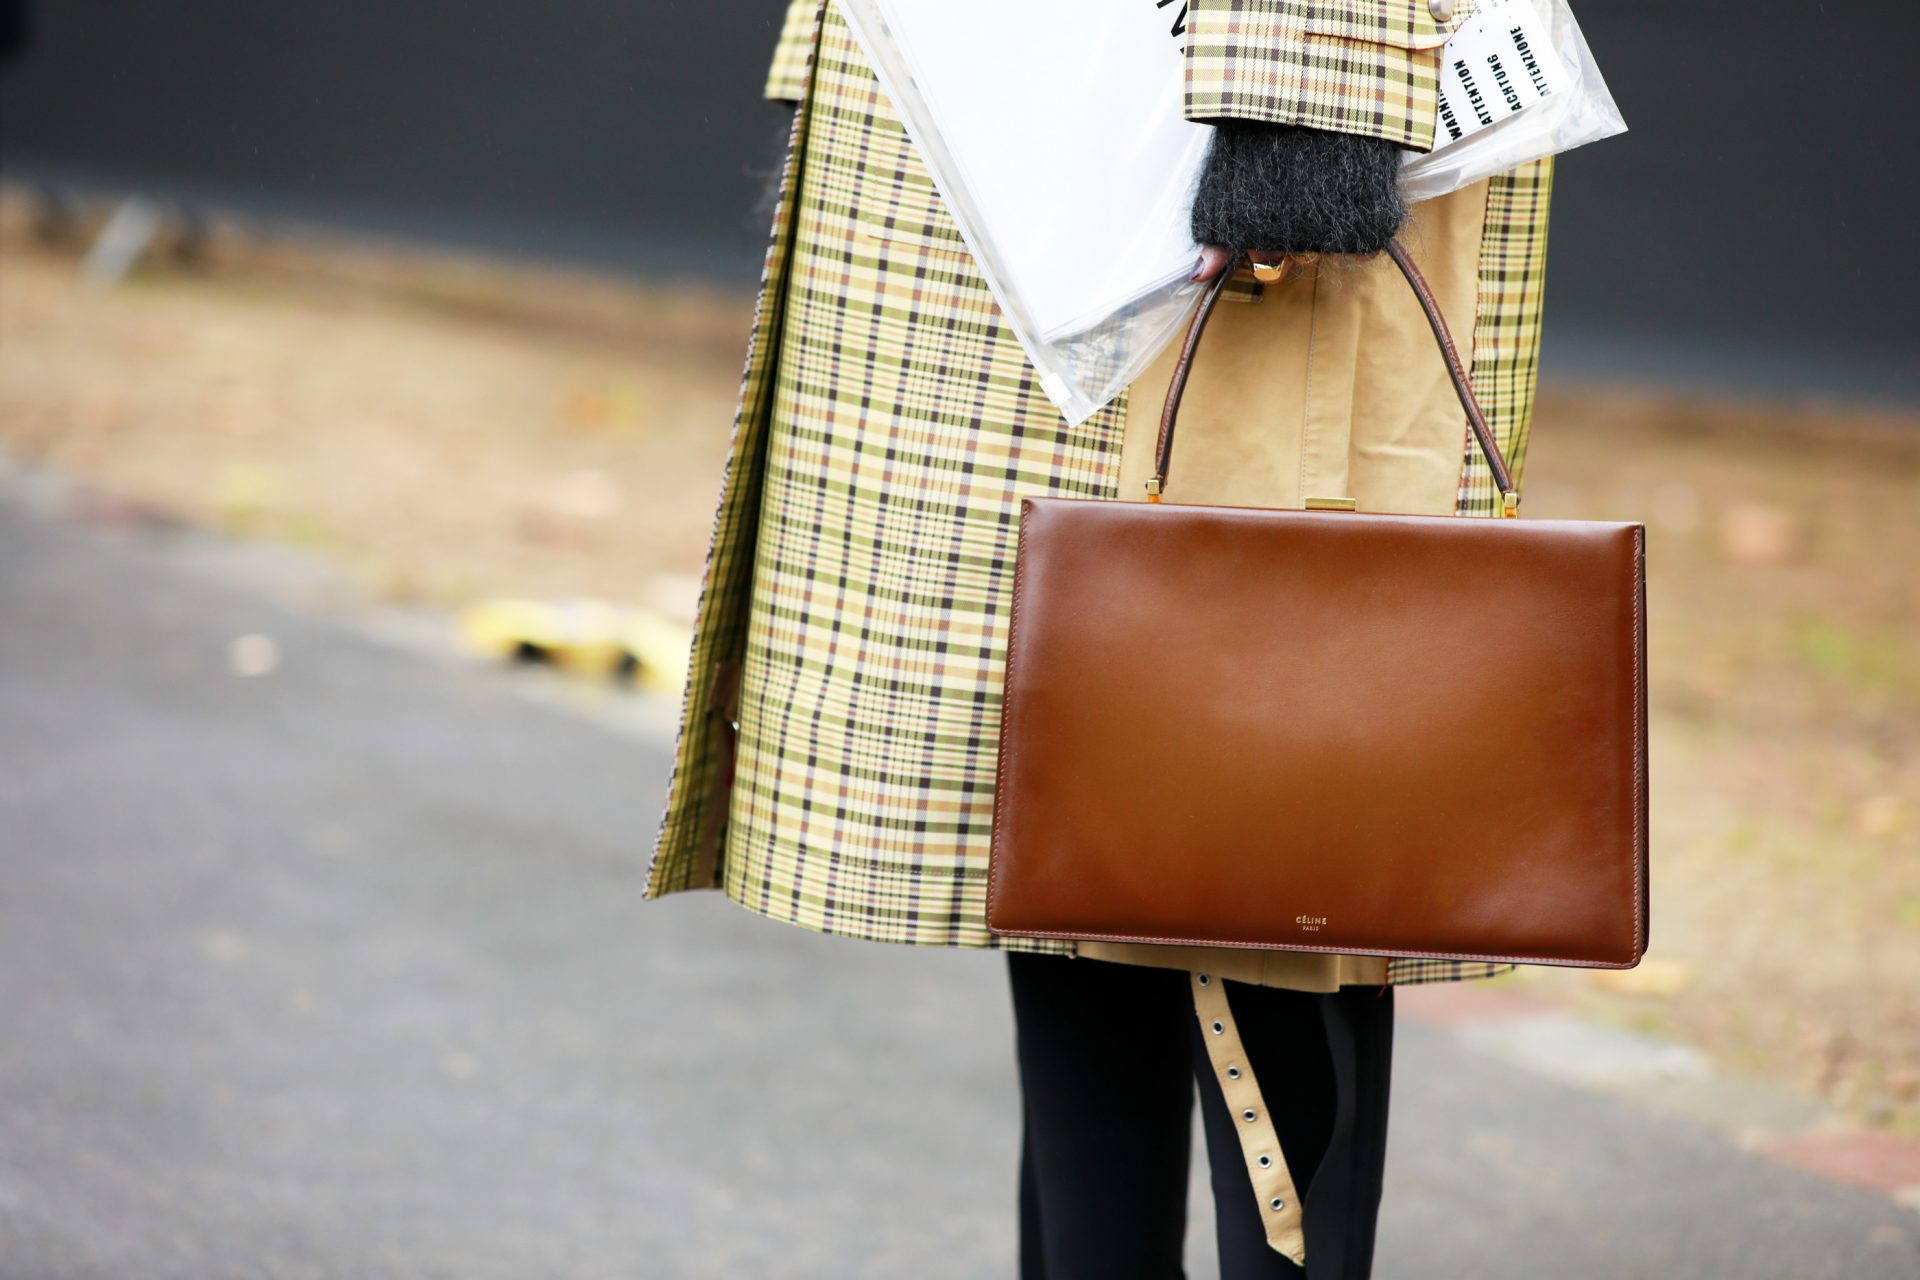 celine clasp bag street style